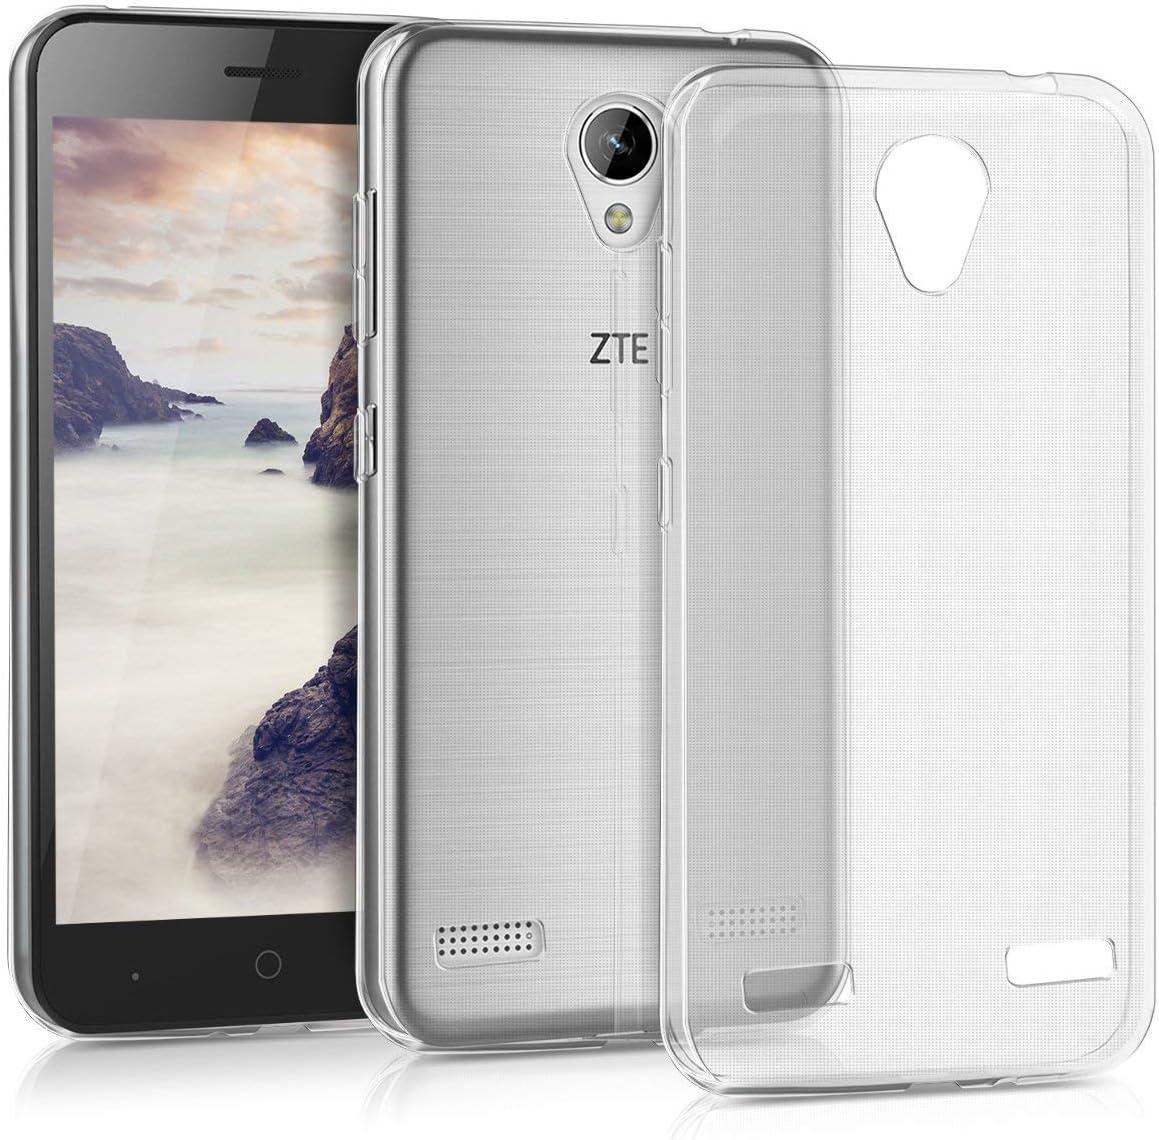 MB ACCESORIOS Funda Silicona Transparente para ZTE Blade A520: Amazon.es: Electrónica